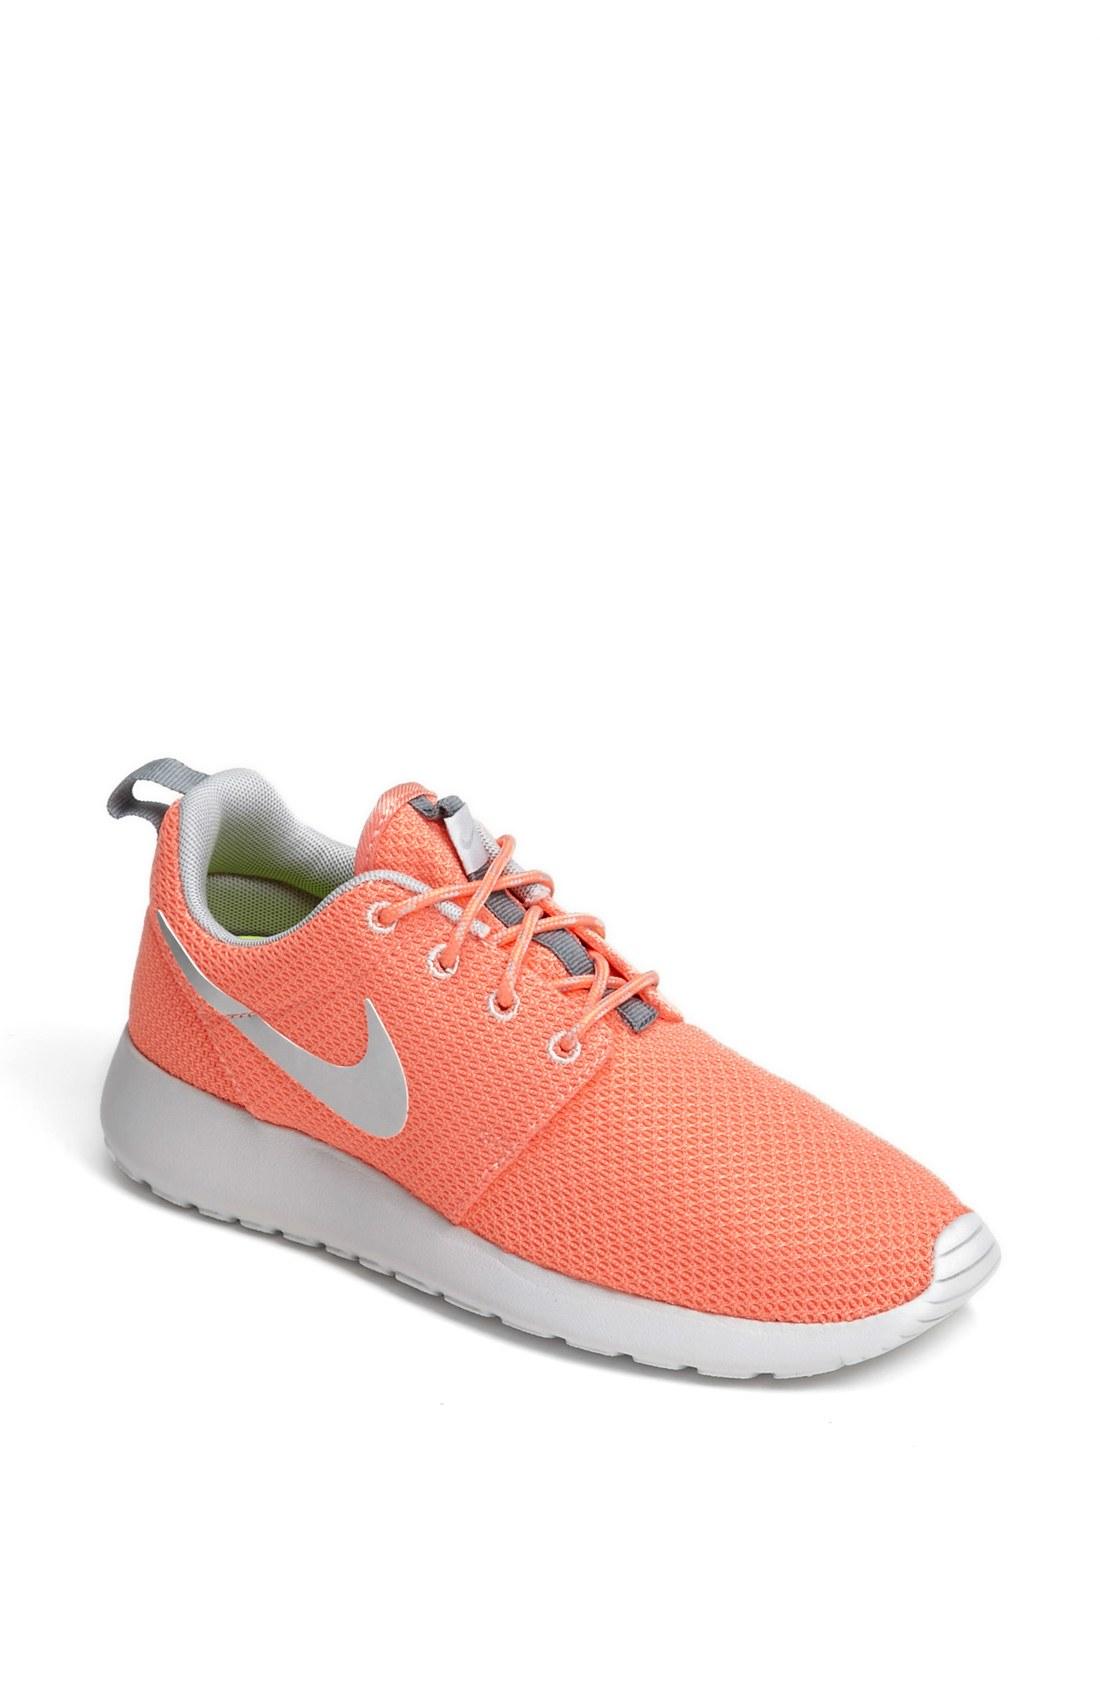 nike roshe run sneaker in orange atomic pink silver. Black Bedroom Furniture Sets. Home Design Ideas